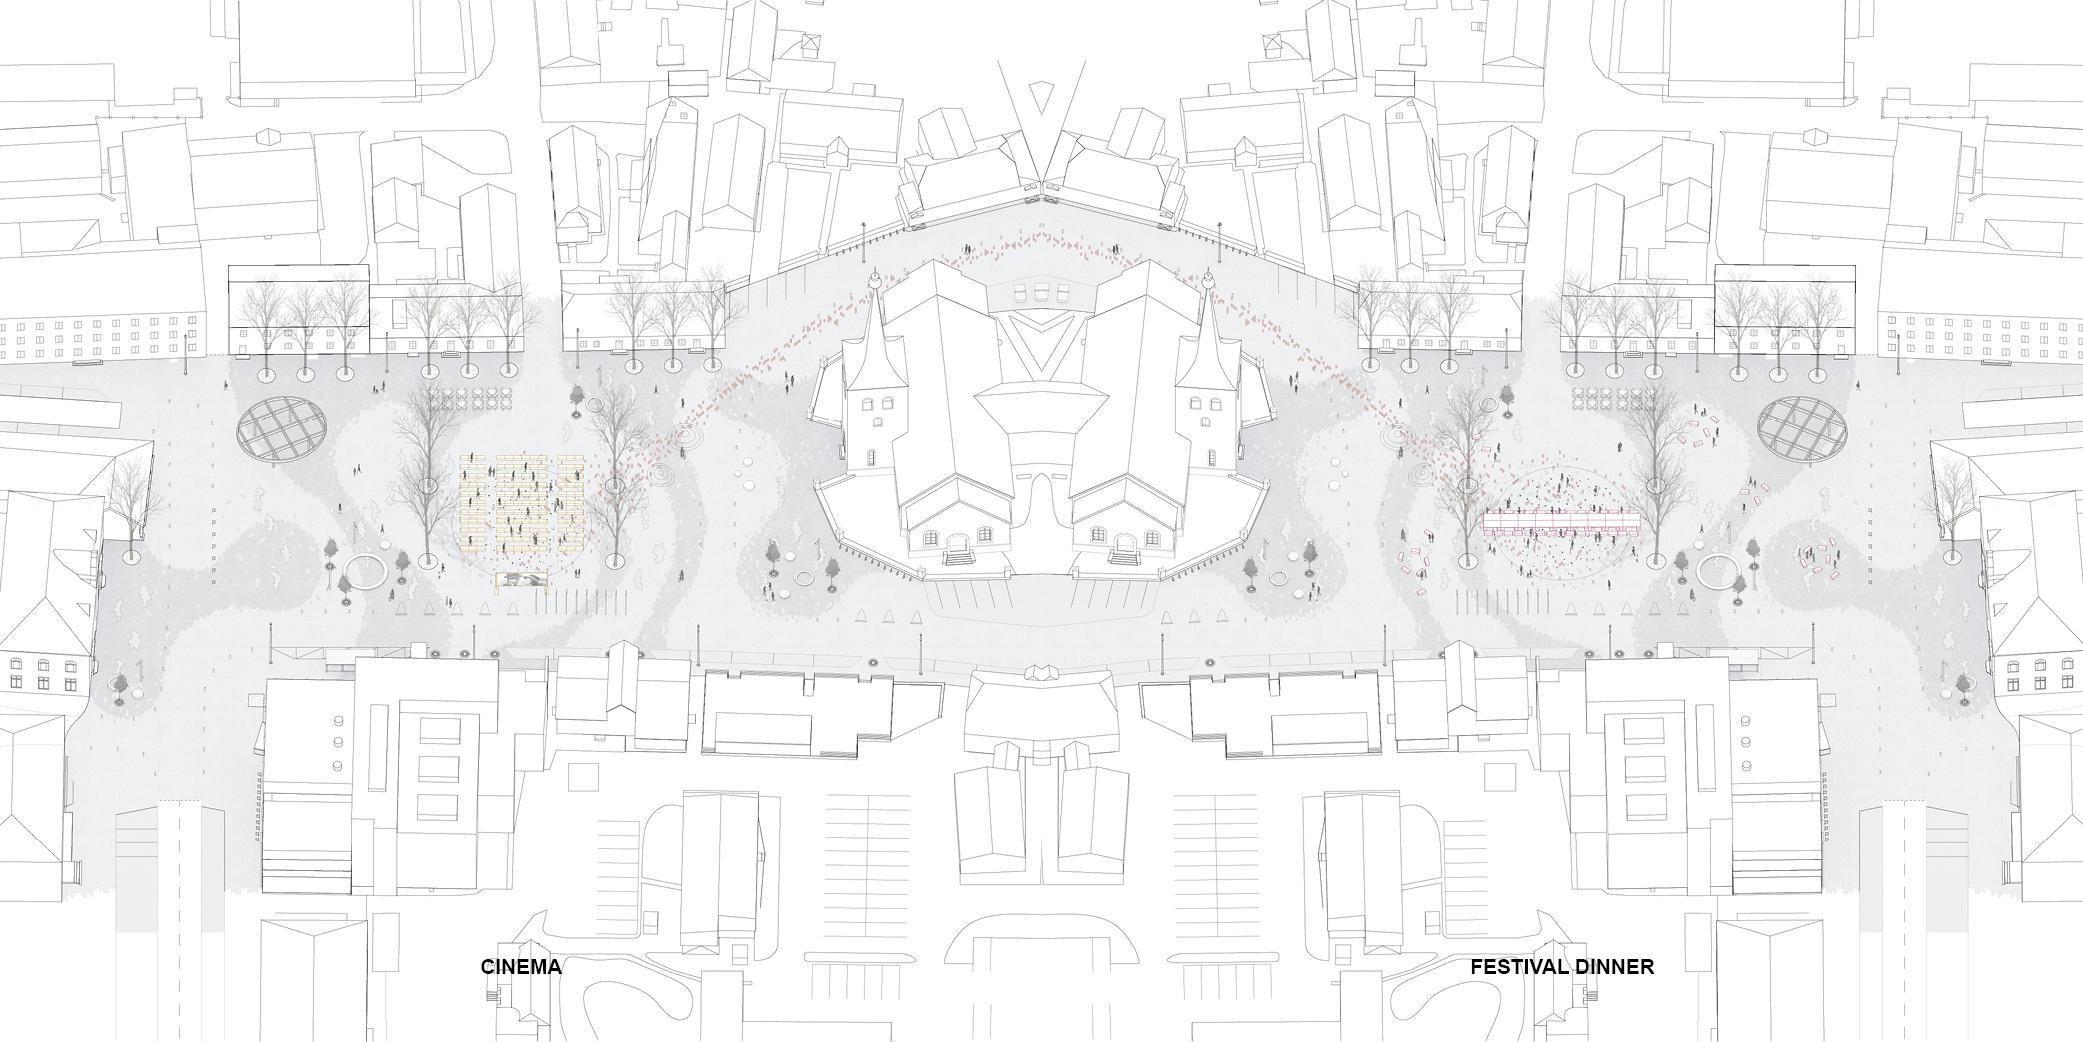 OCA architects urban architecture competition Paide Central Paide keskvaljaku arhitektuurivoistluse Hernan Lleida Ruiz Bernardo Garcia Morales Linn Nagel_web16